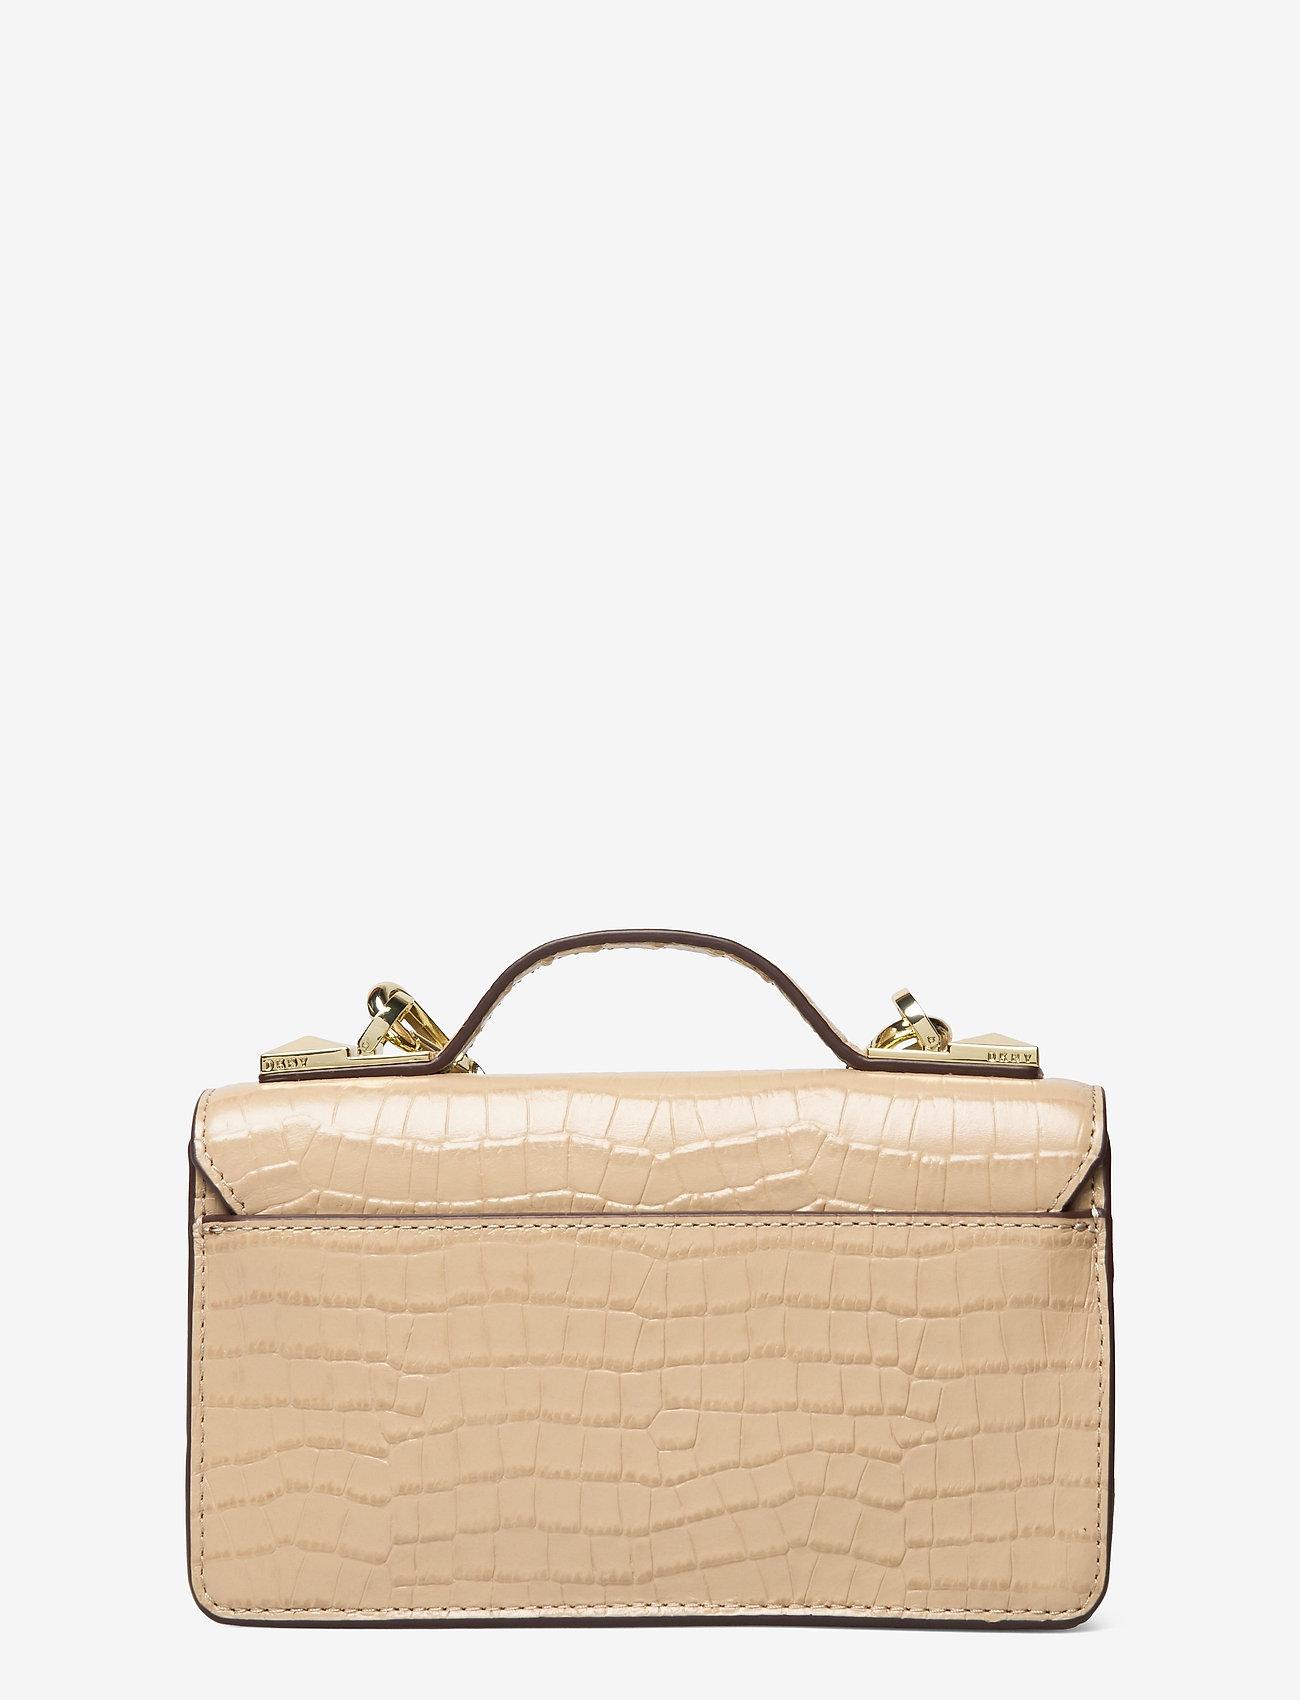 DKNY Bags - HANDBAG - handväskor - udj - jute - 1